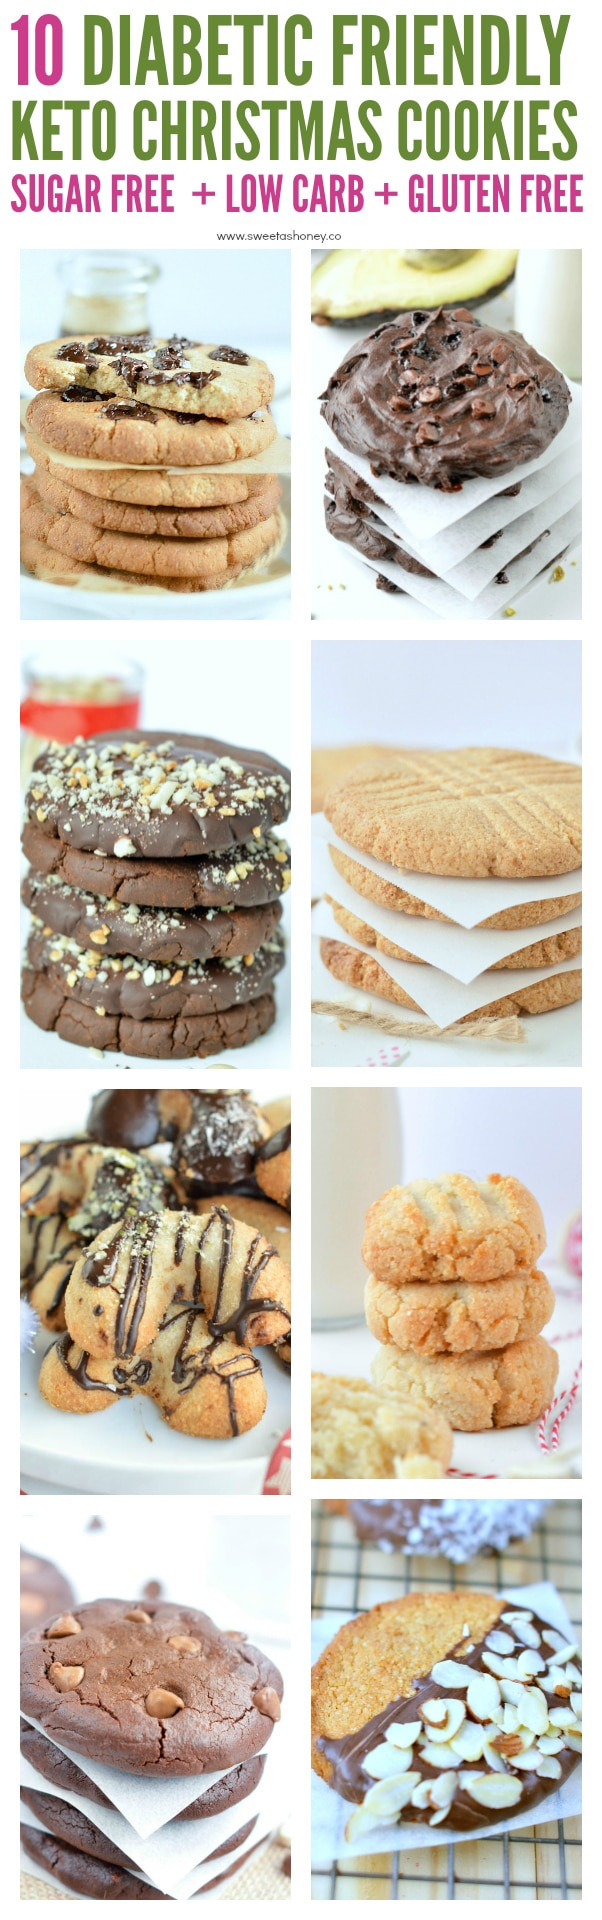 Diabetic Christmas Cookies Recipes  Diabetic Christmas Cookies Keto gluten free Sweetashoney